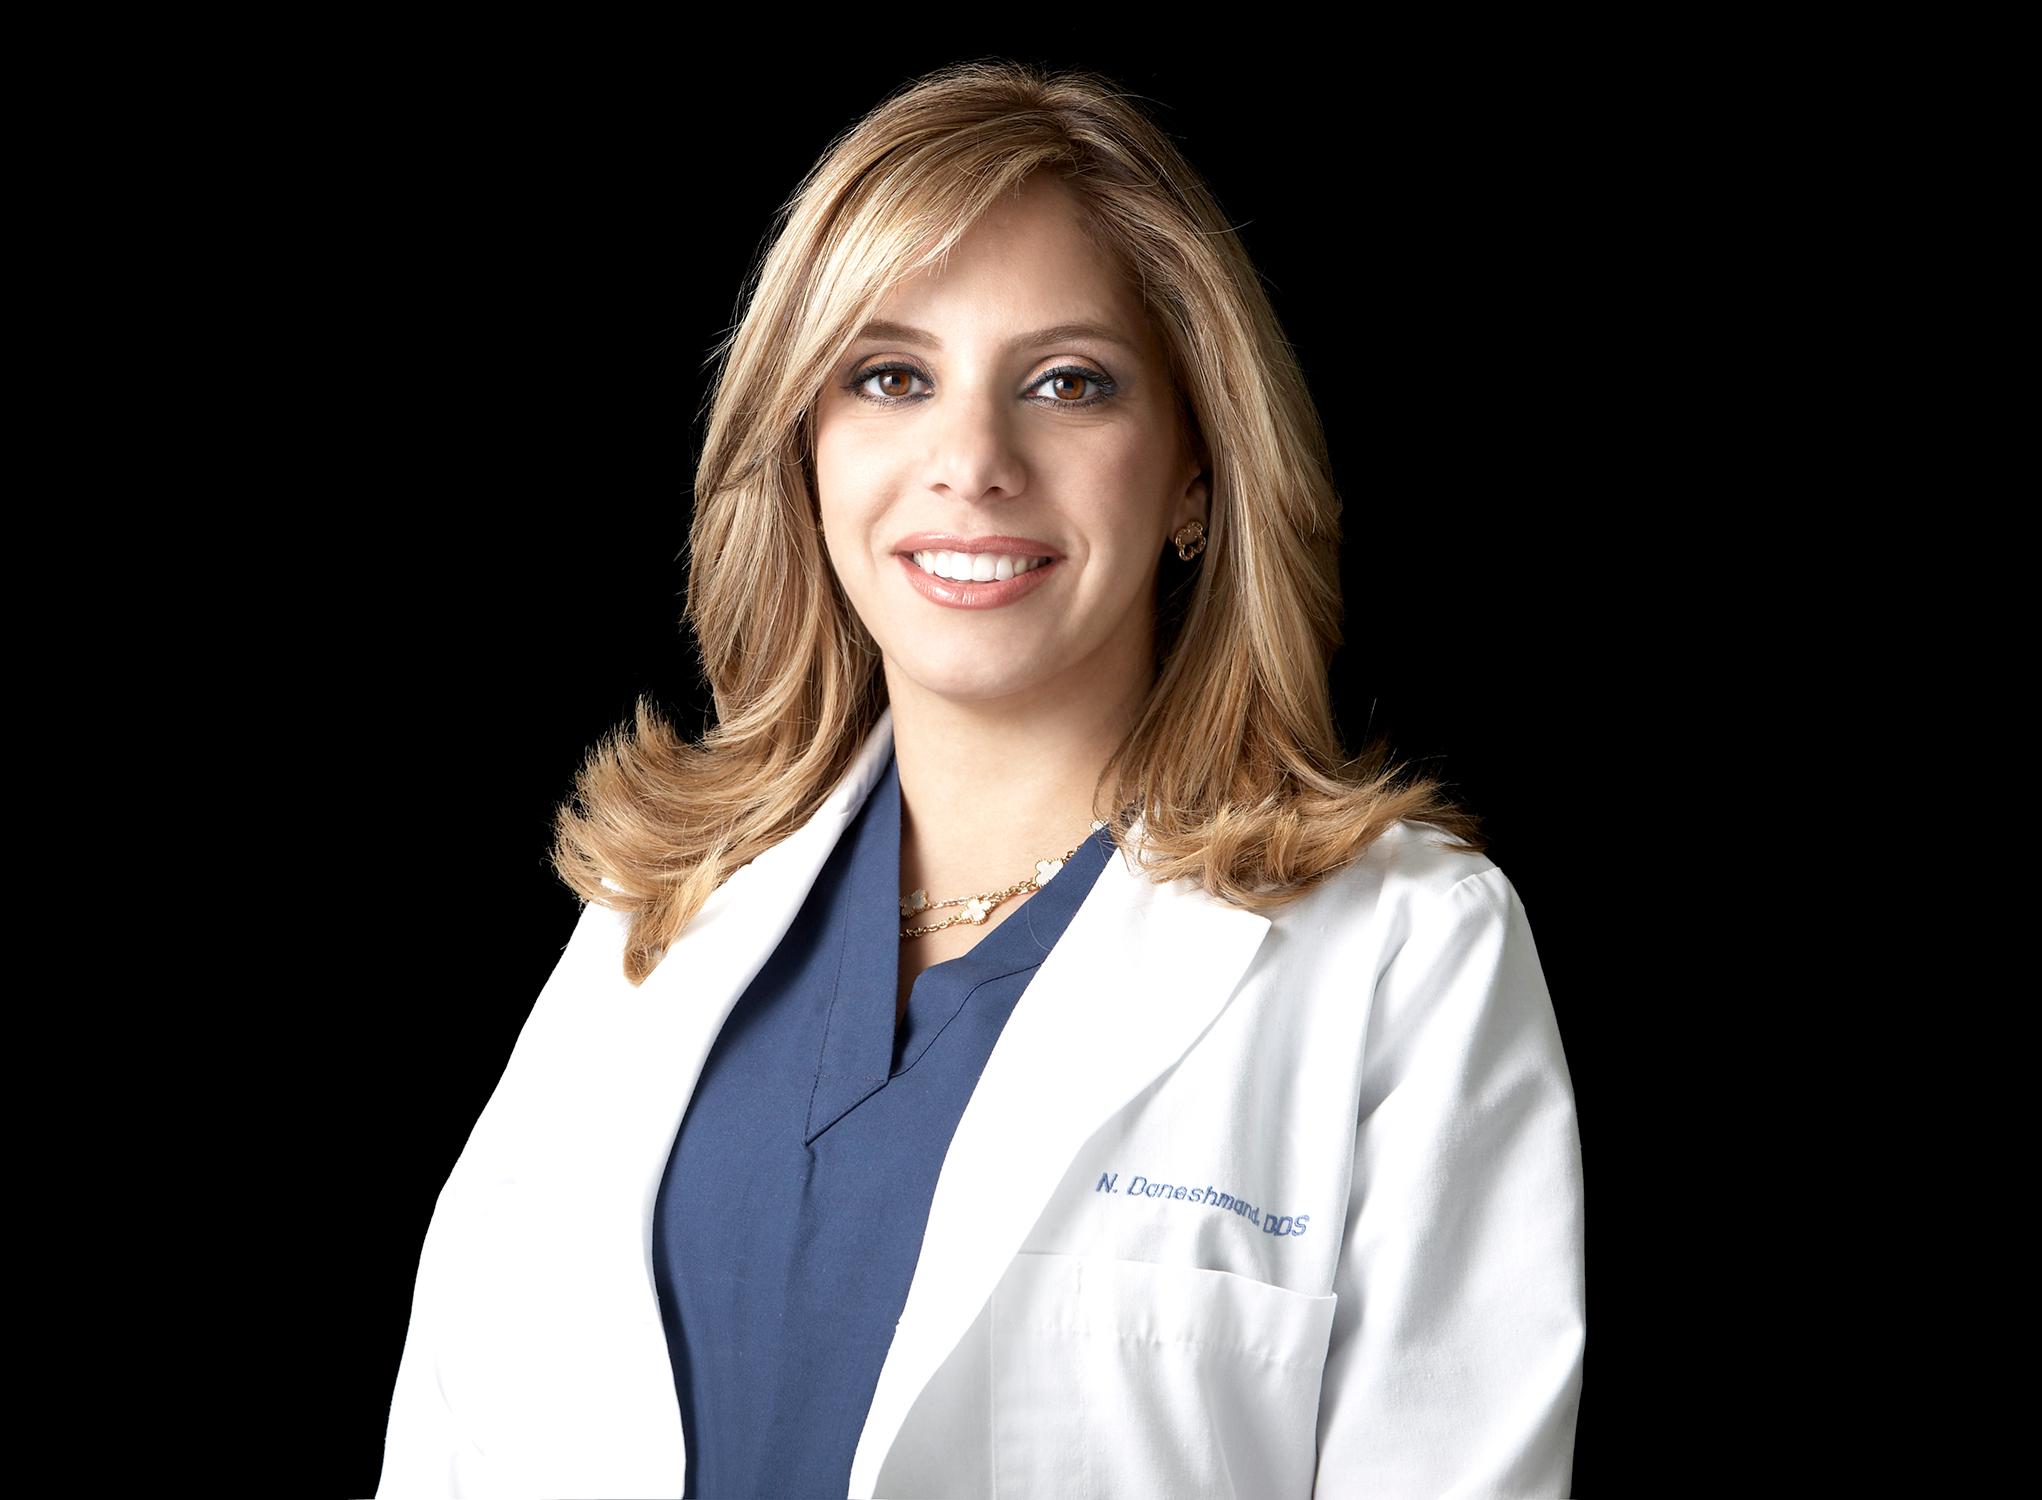 DOCTOR-ABDY-MOSHREFI-D.D.S-.,M.S.F-PROFILE-PORTRAIT-BY-JONATHAN-R-BECKERMAN-PHOTOGRAPHY-CALIFORNIA.jpg